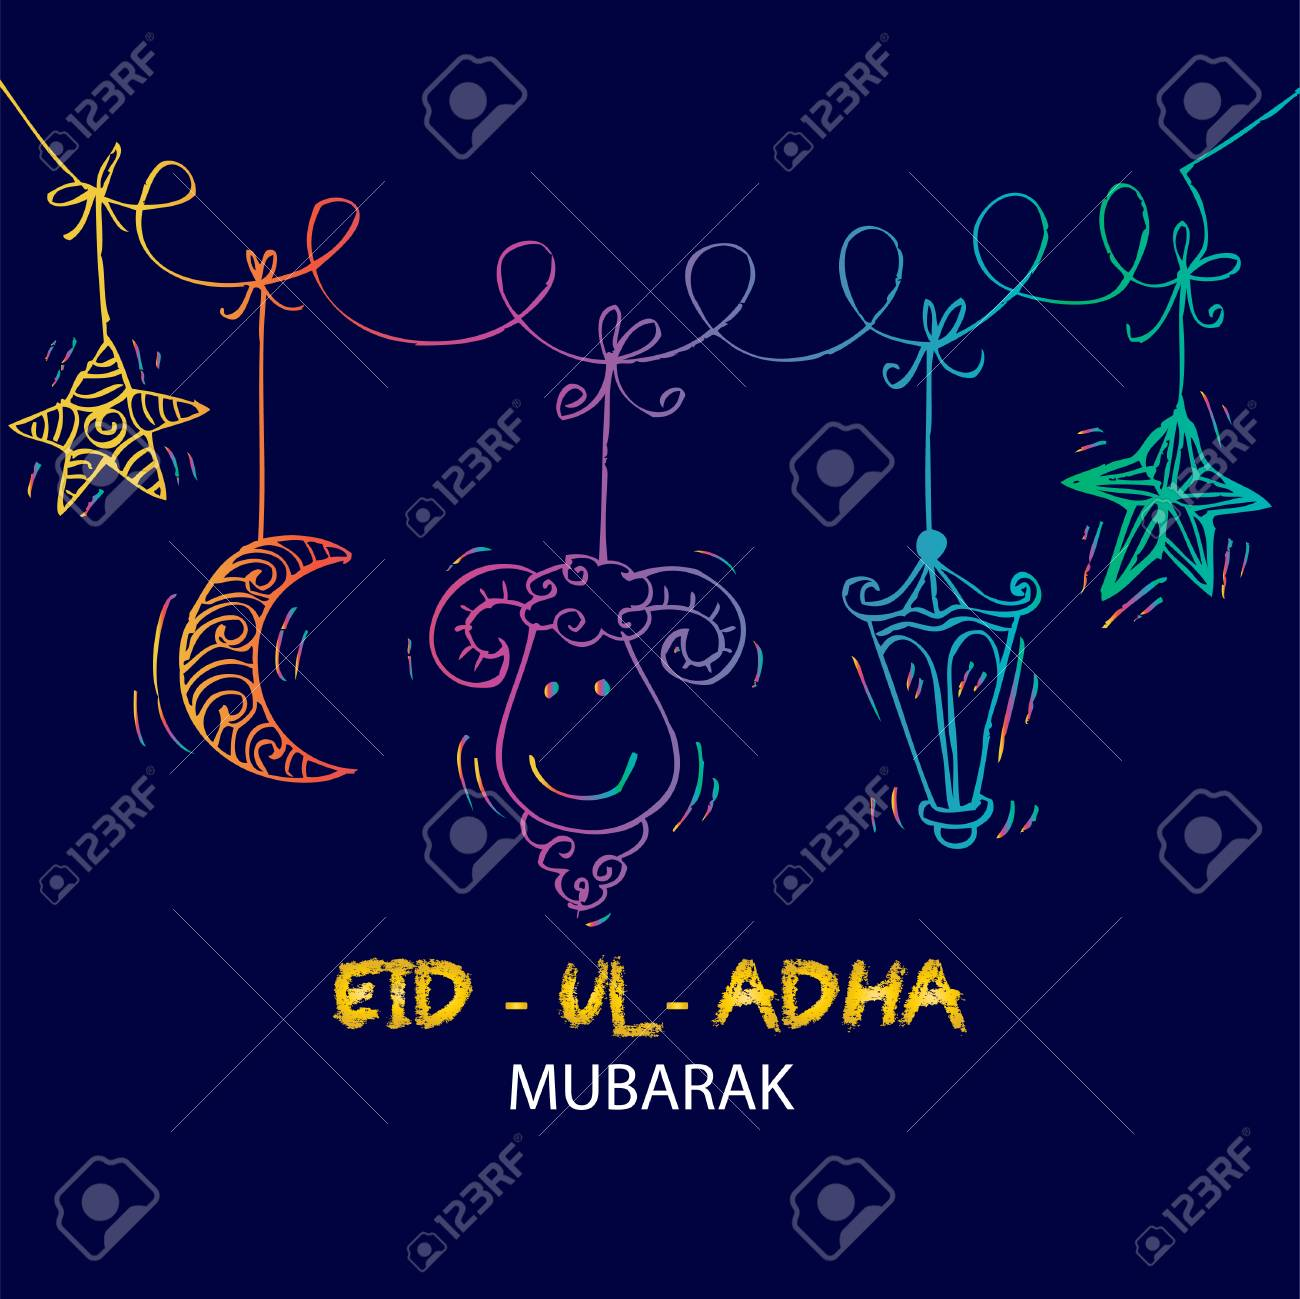 Greeting card design for muslim community festival eid ul adha greeting card design for muslim community festival eid ul adha stock vector 84919414 m4hsunfo Gallery